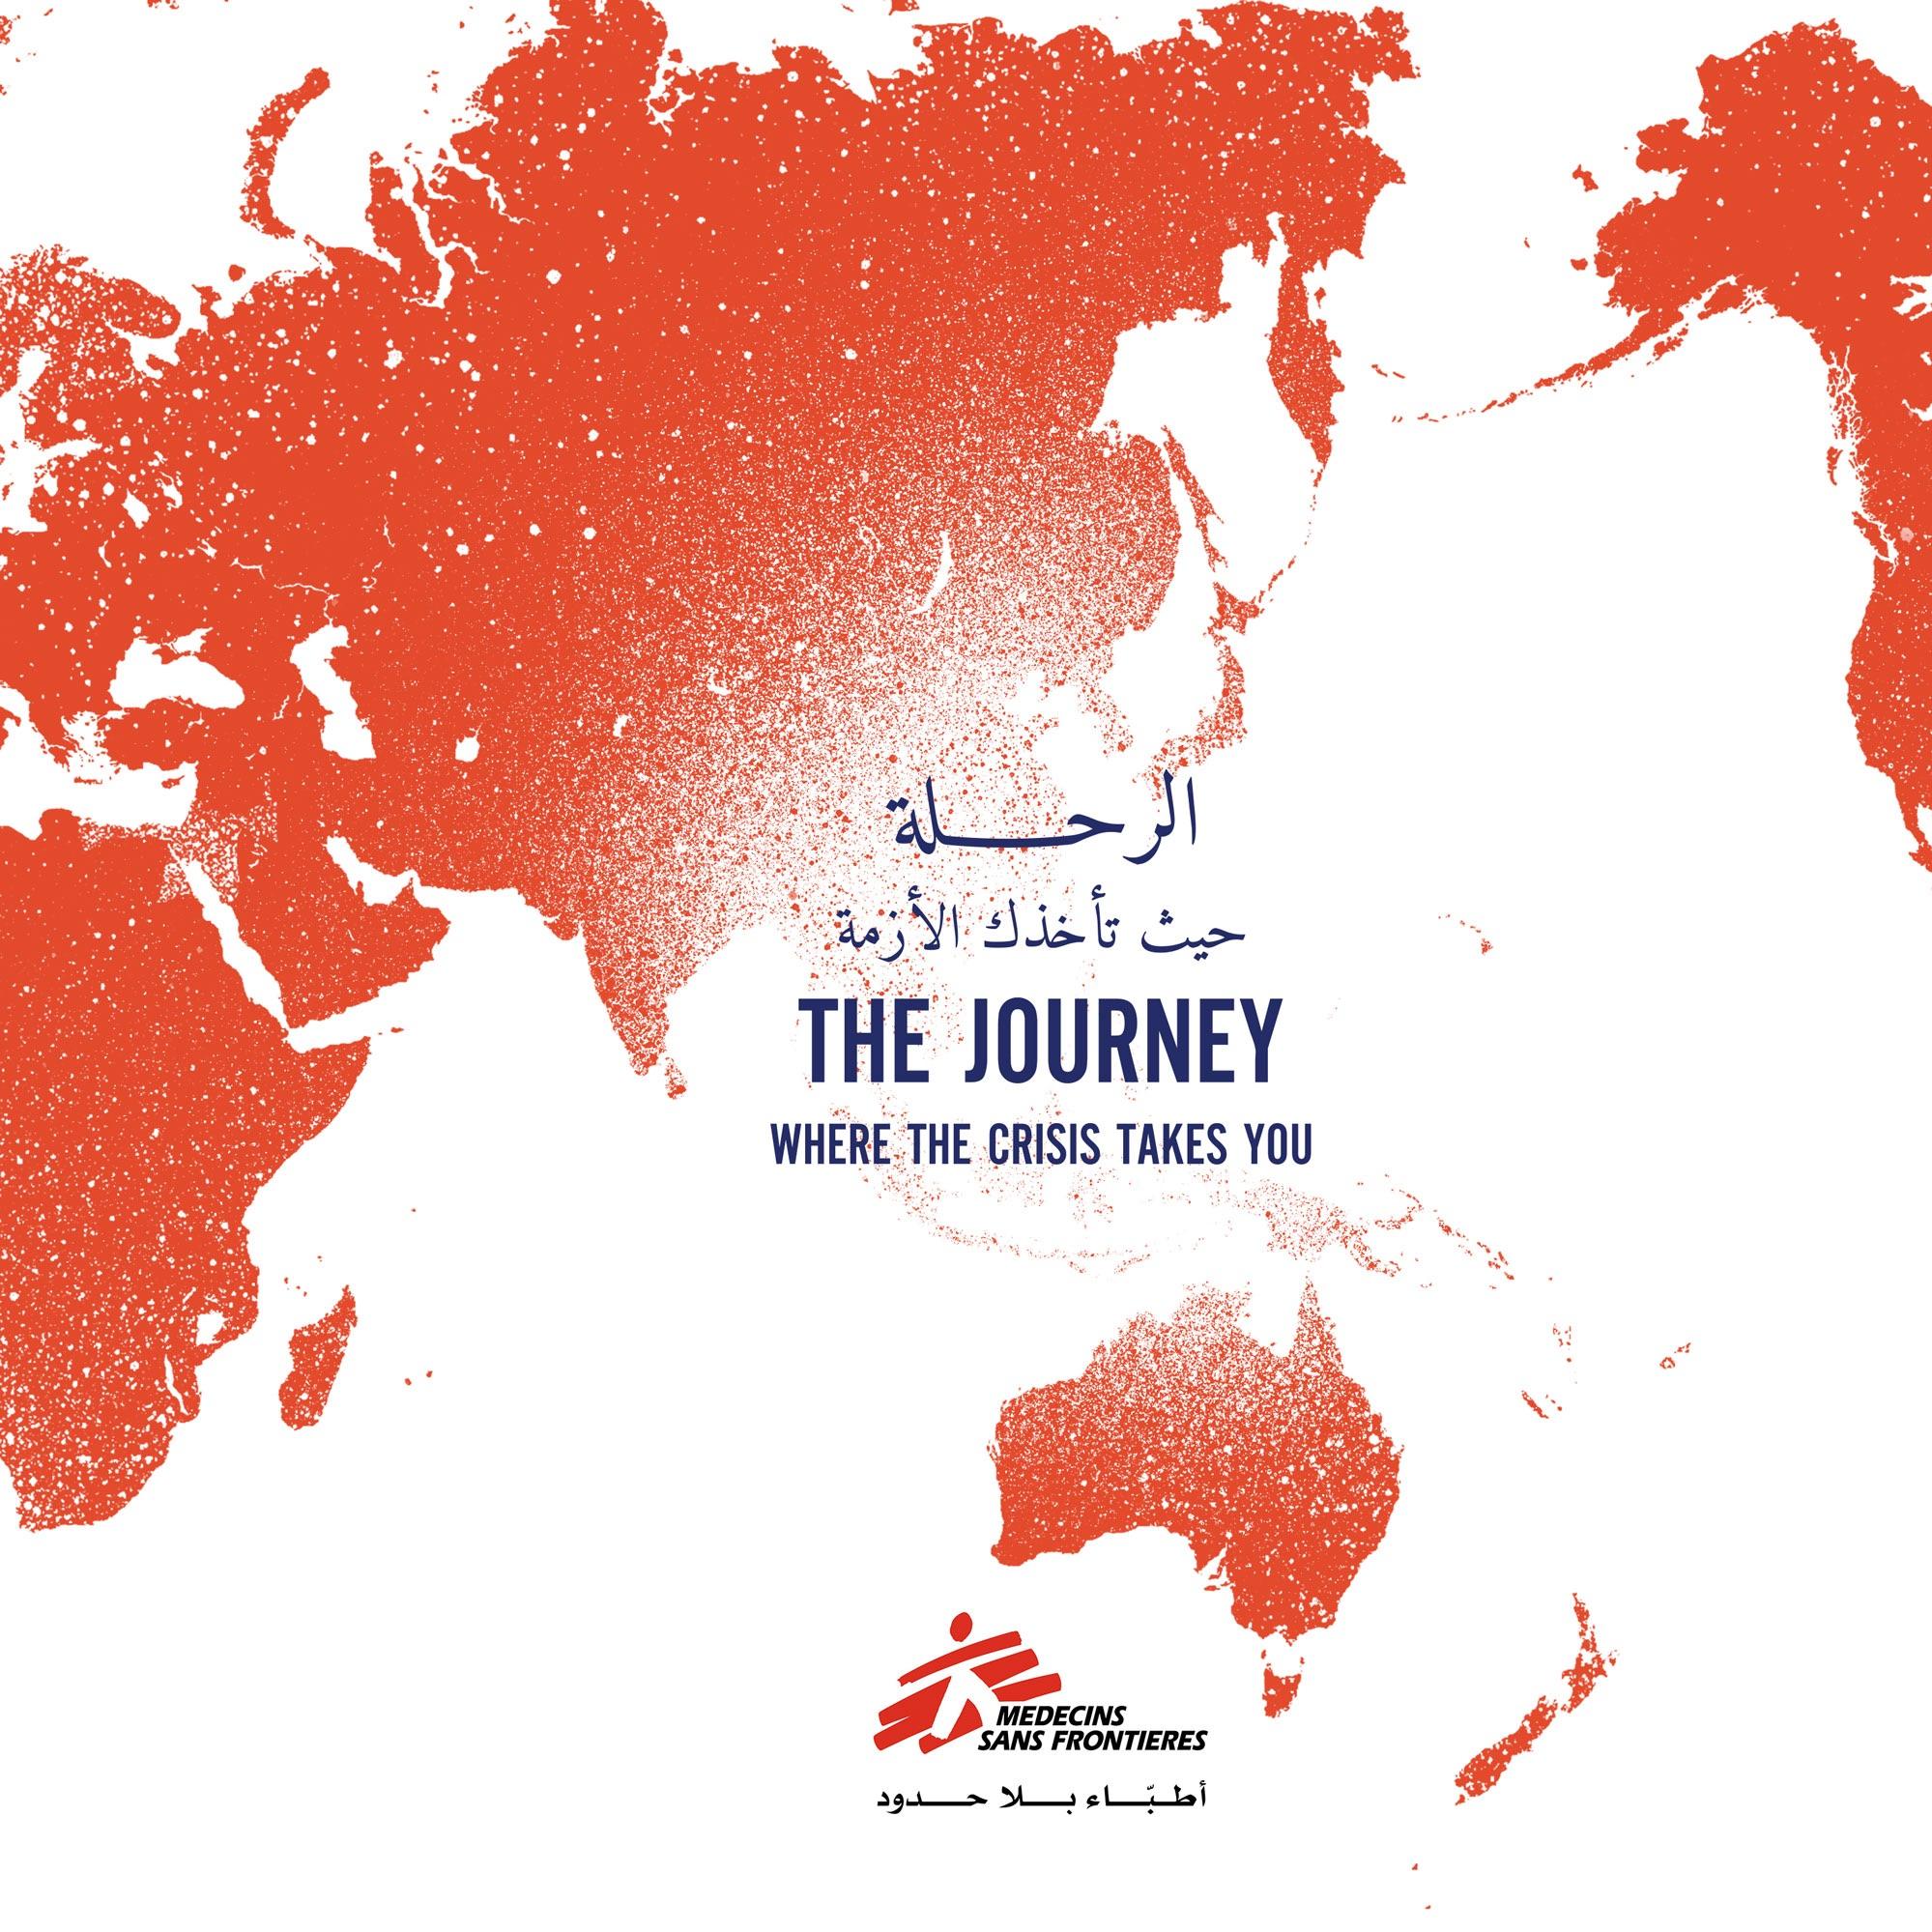 ما هو برنامج الرحلة؟ | What is the podcast the Journey?